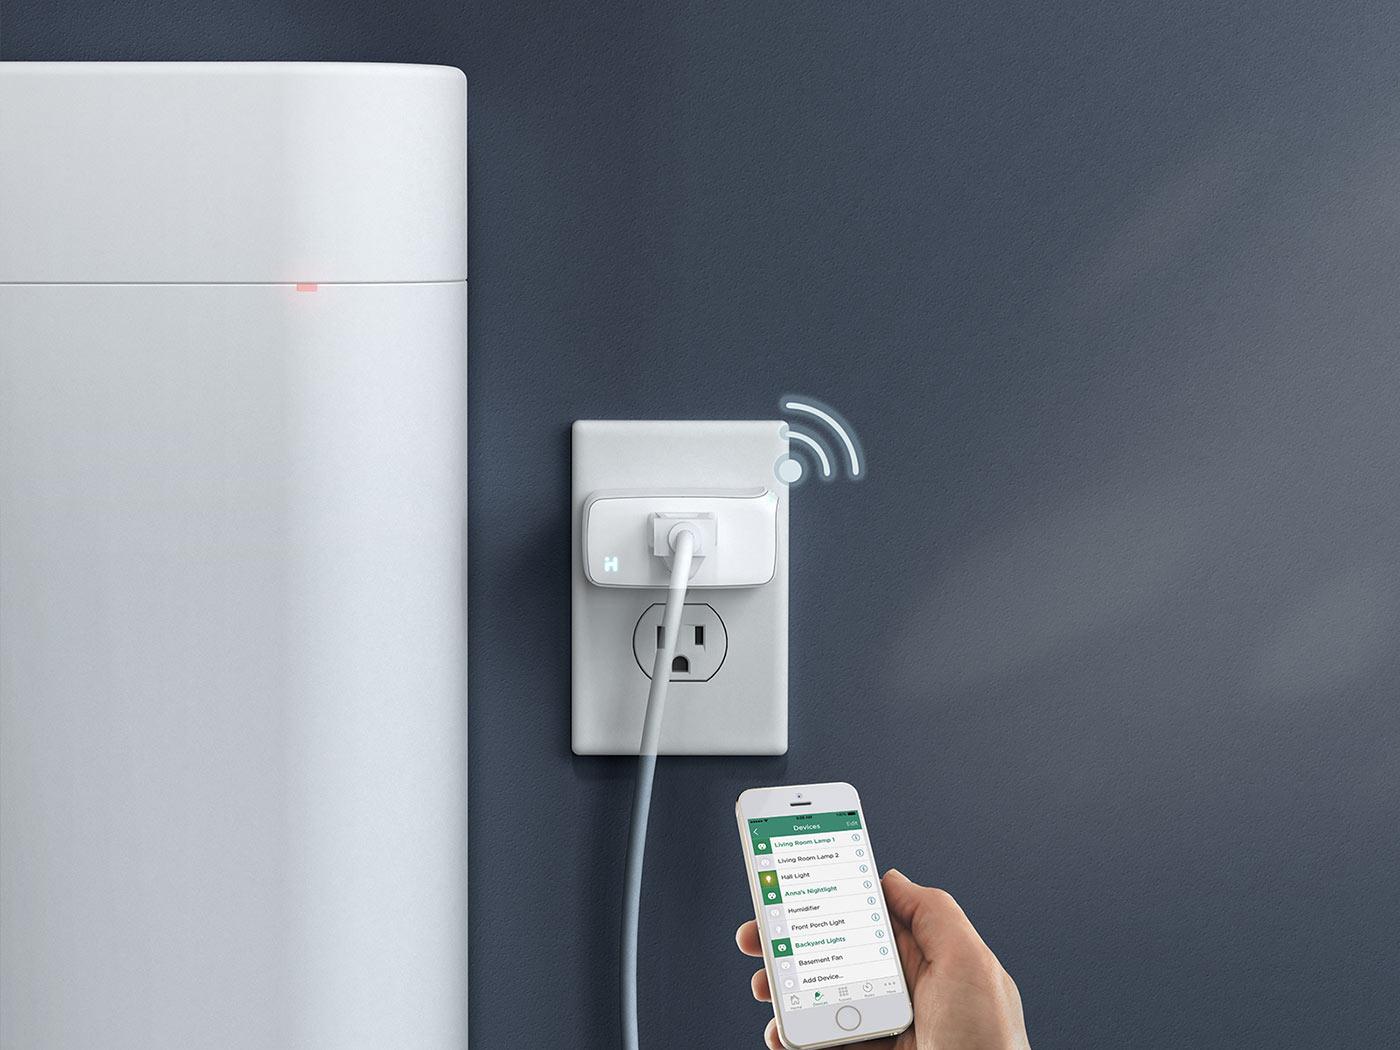 Sensational Ihome Iot Smart Plug Envary Download Free Architecture Designs Rallybritishbridgeorg